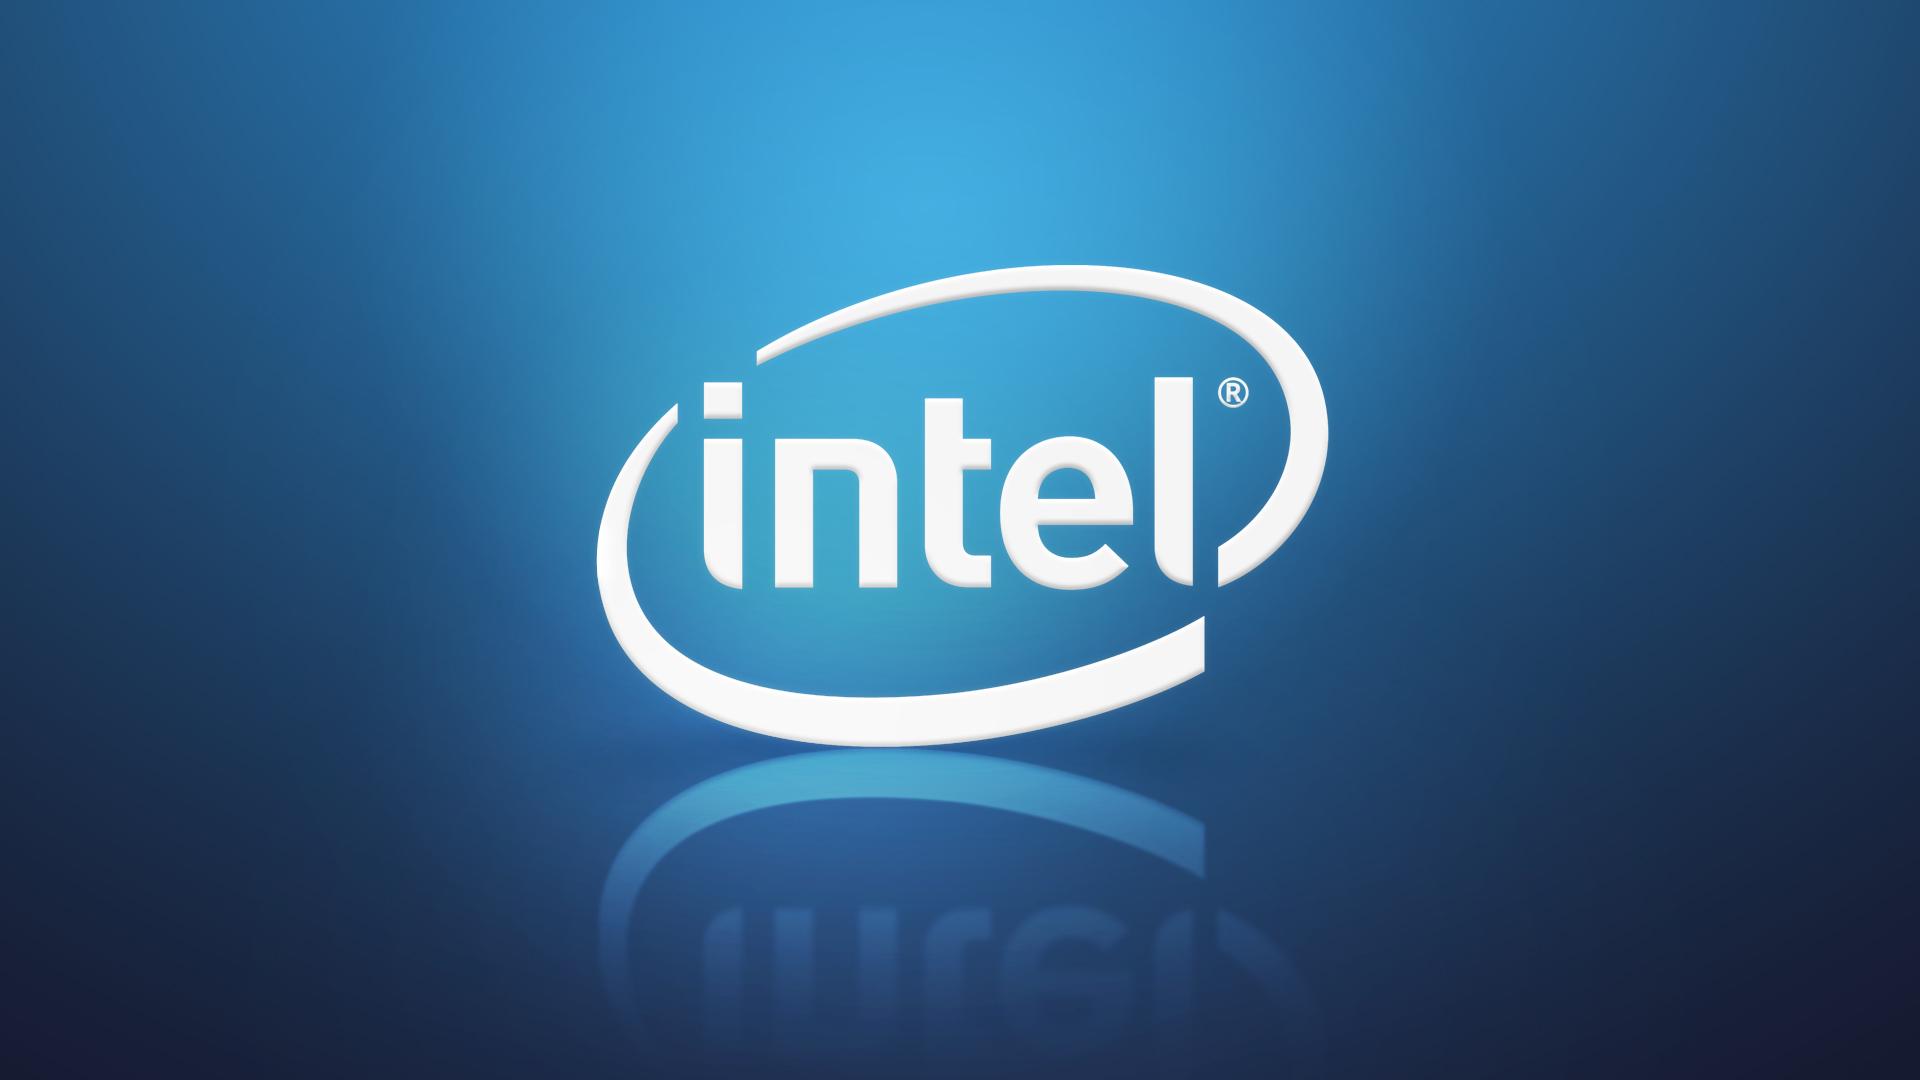 47] Intel Logo Wallpaper on WallpaperSafari 1920x1080